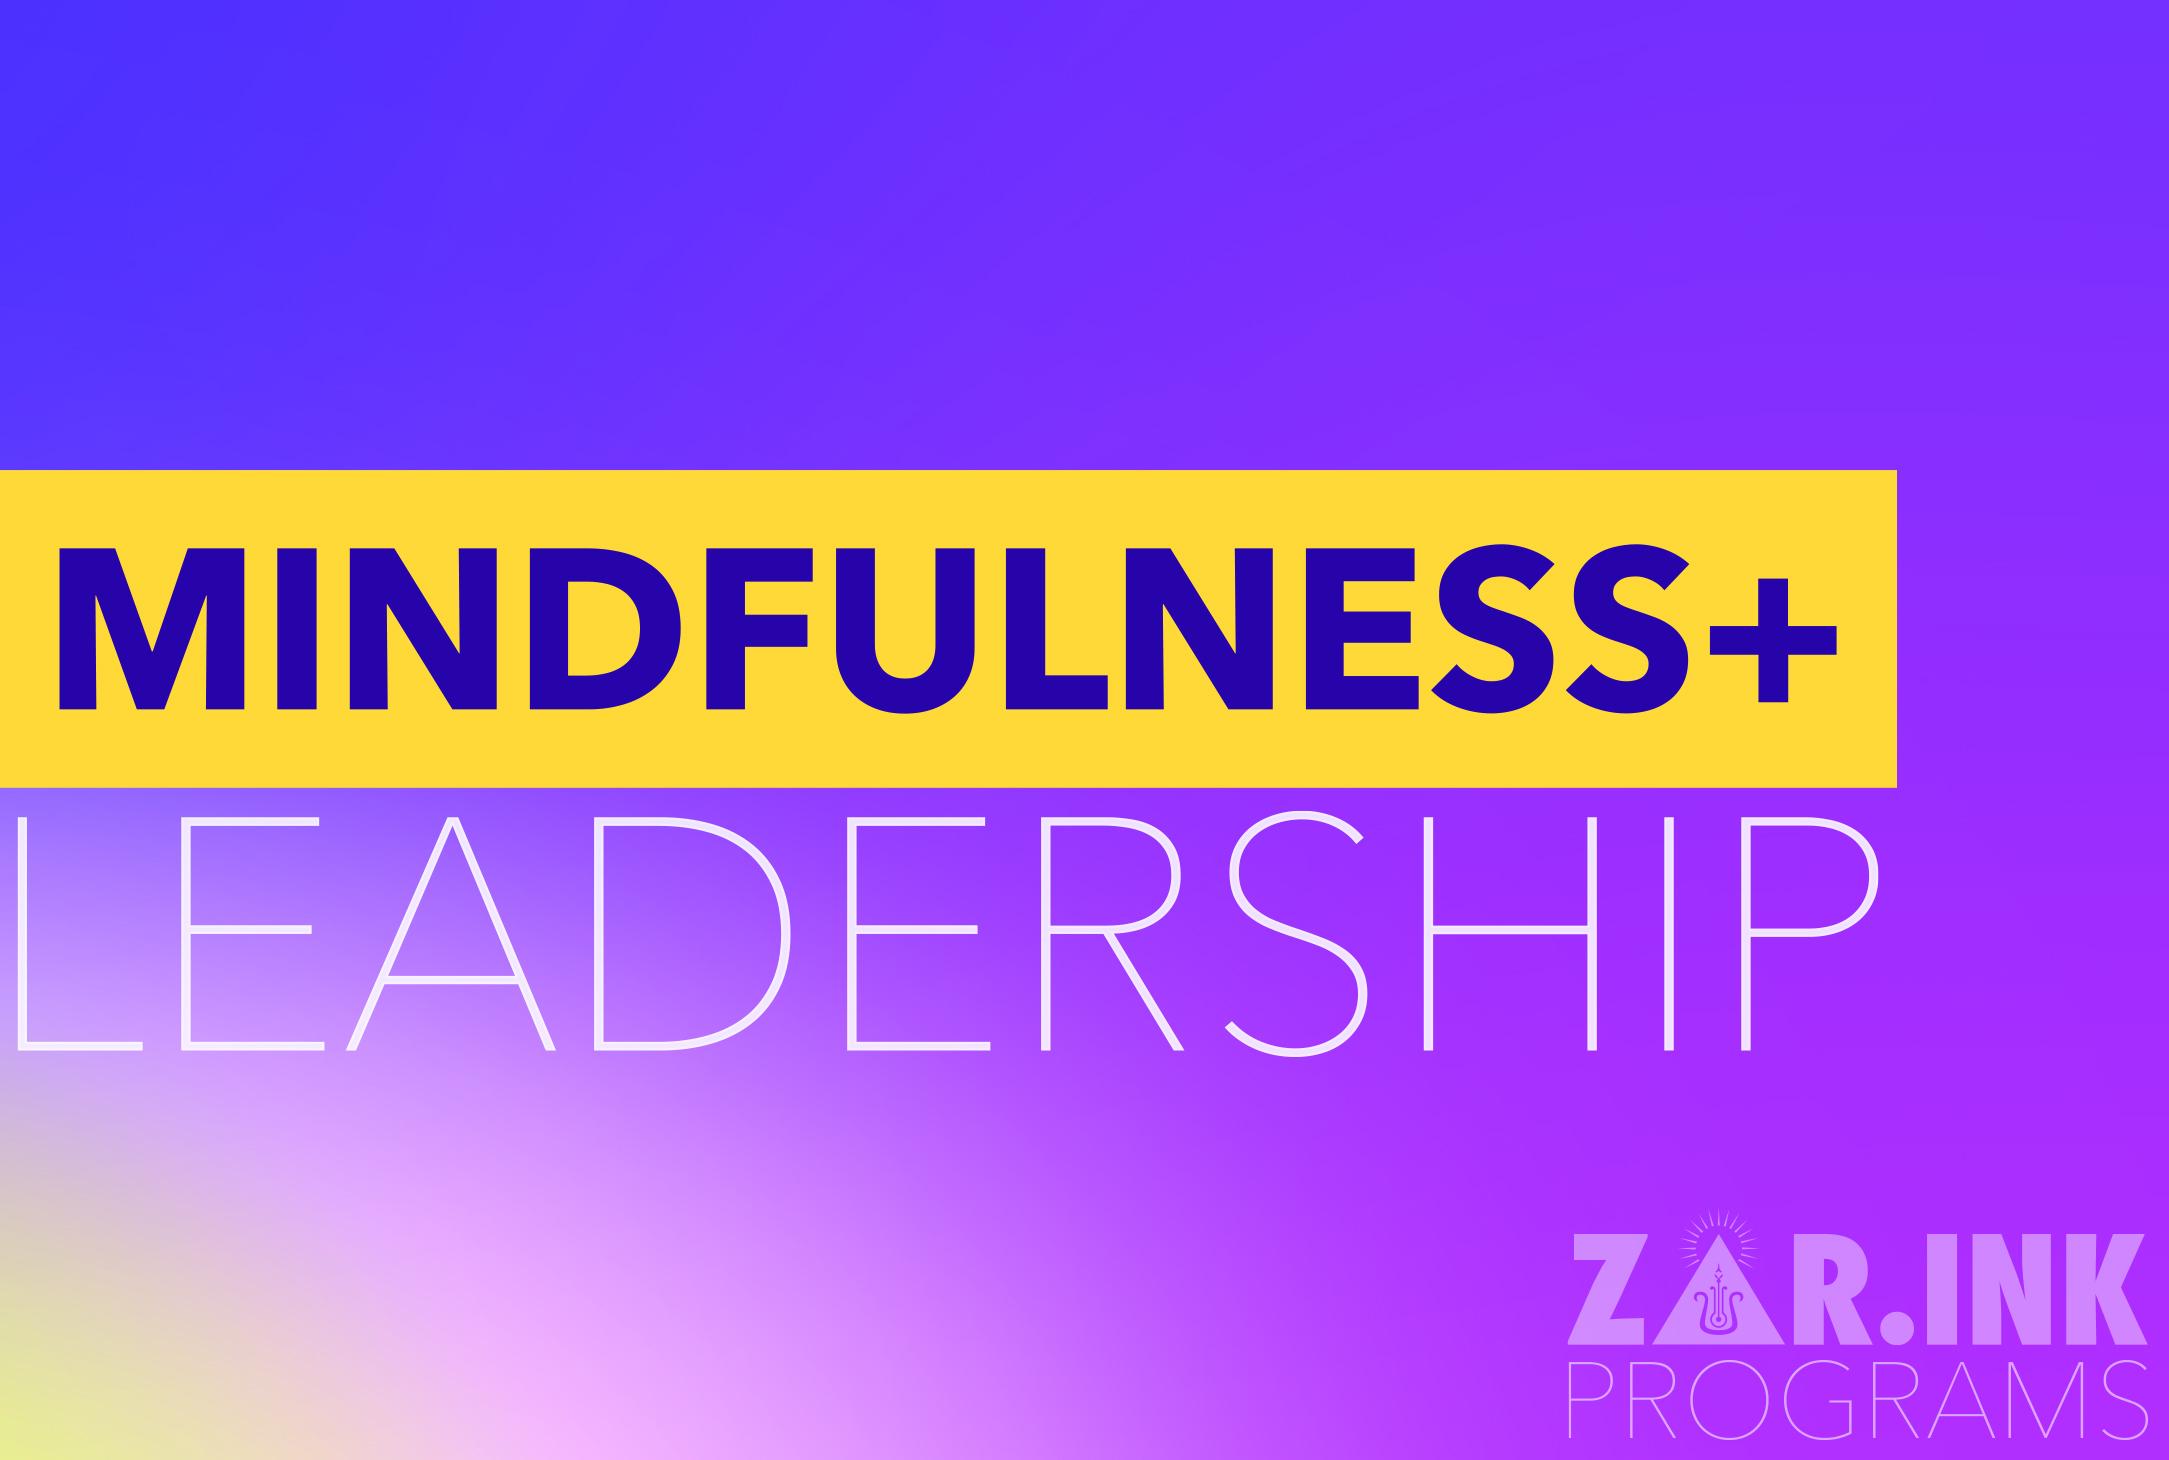 ZAR INK Mindfulness Plus Leadership Program